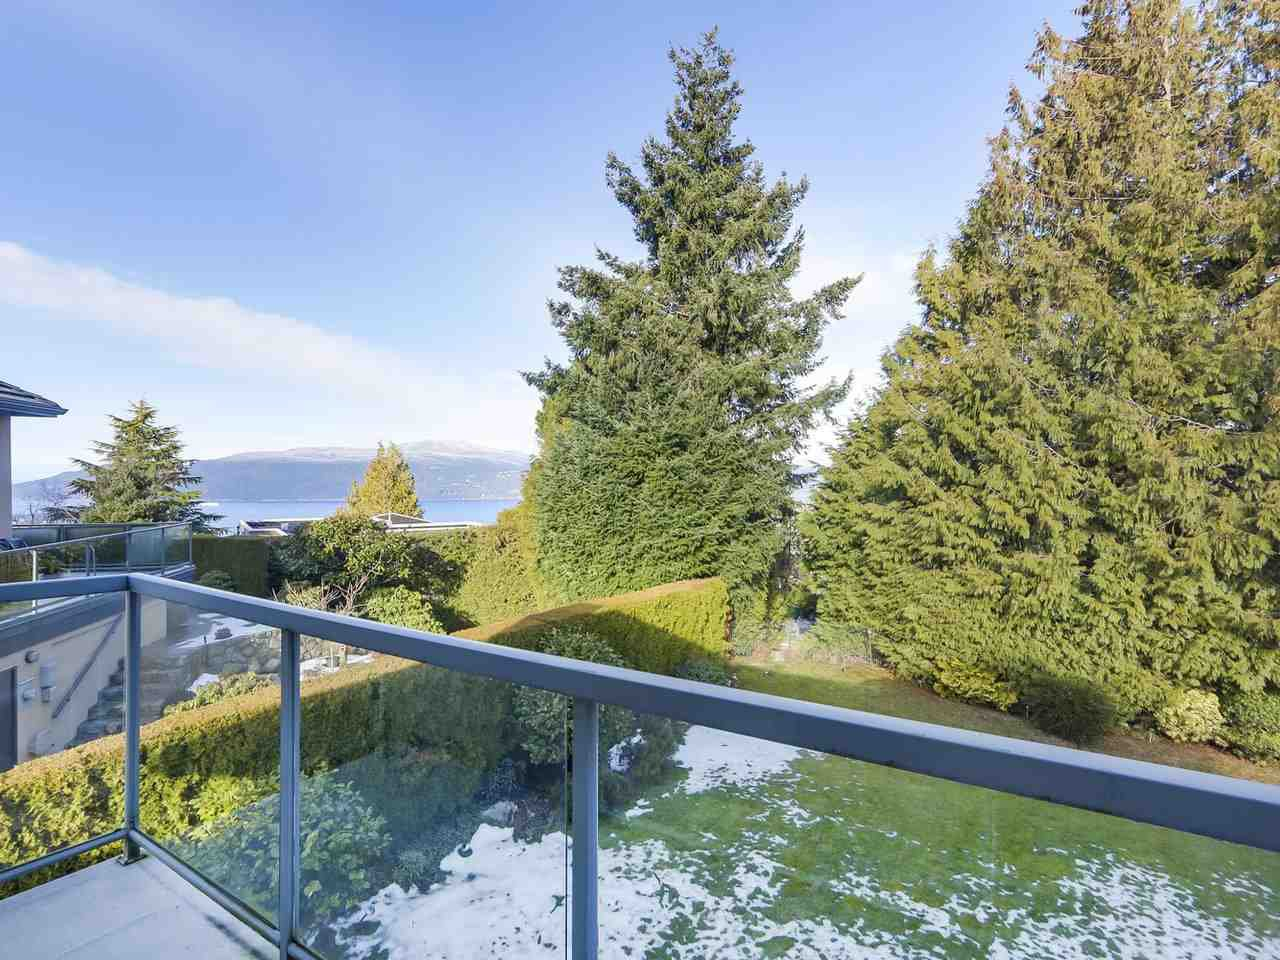 Photo 18: Photos: 5441 WEST VISTA COURT in West Vancouver: Upper Caulfeild House for sale : MLS®# R2341877